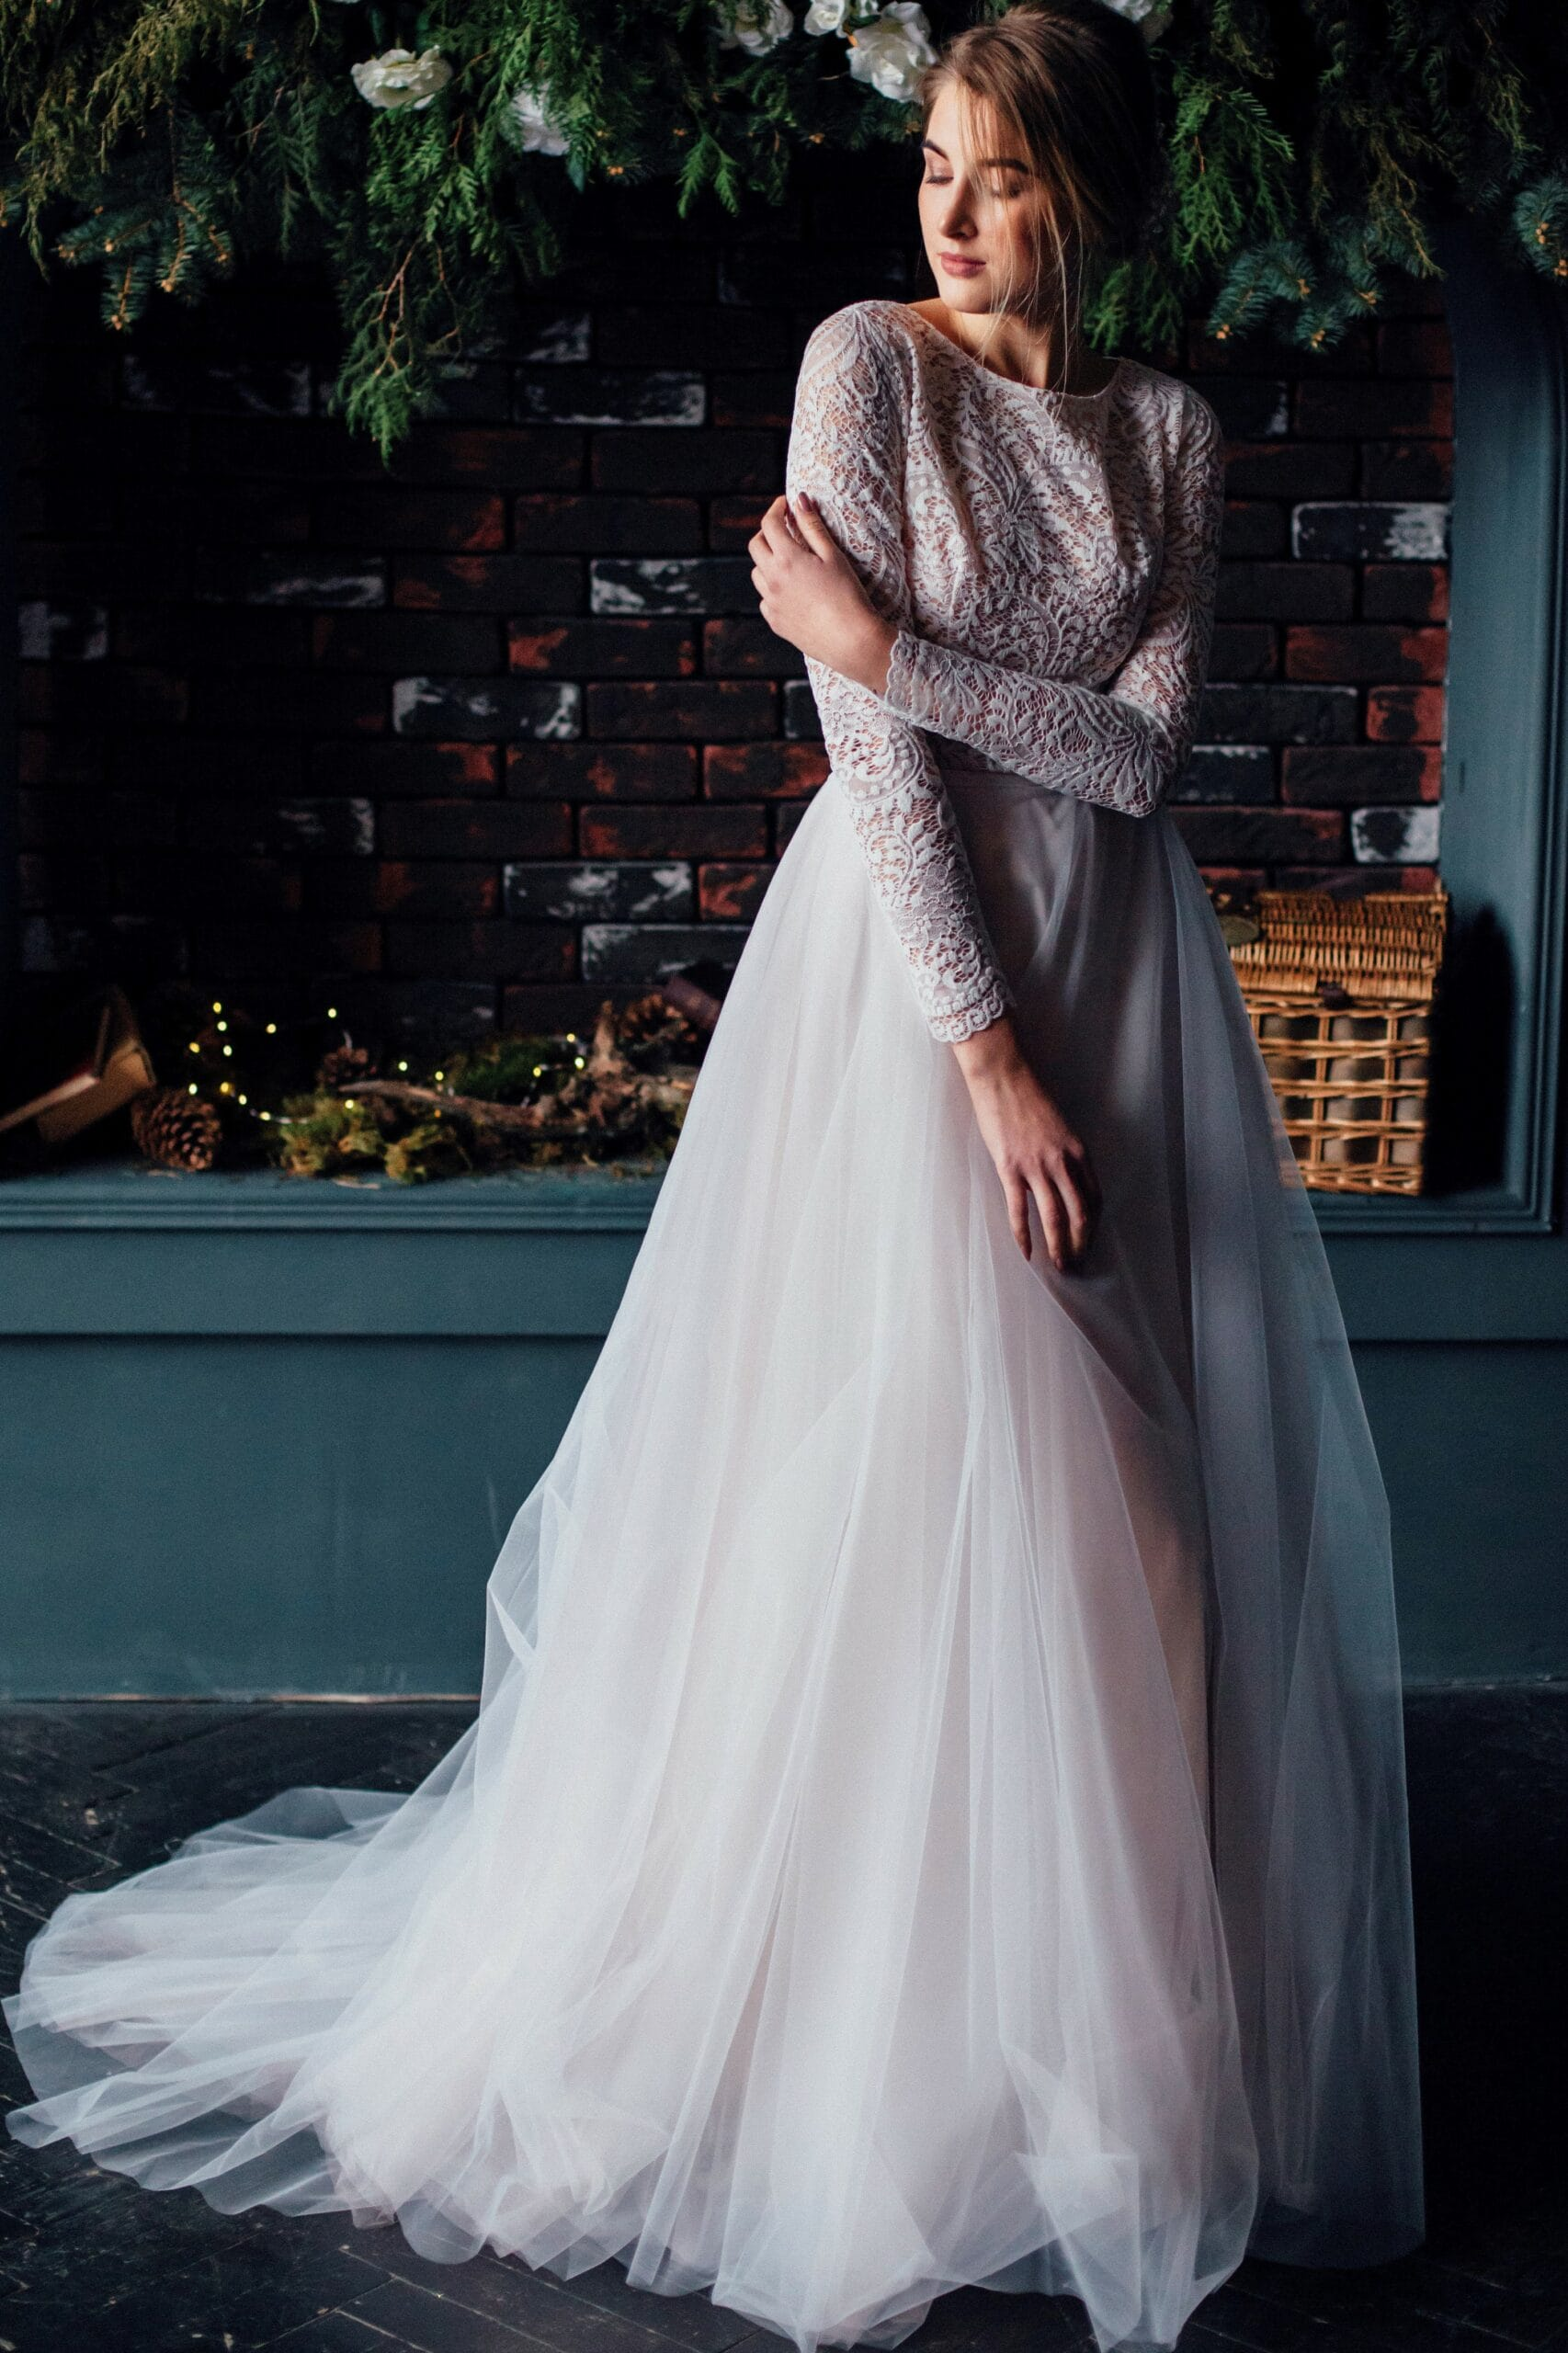 Свадебное платье CAROLINE, коллекция THE ABSOLUTE LOVE, бренд RARE BRIDAL, фото 3